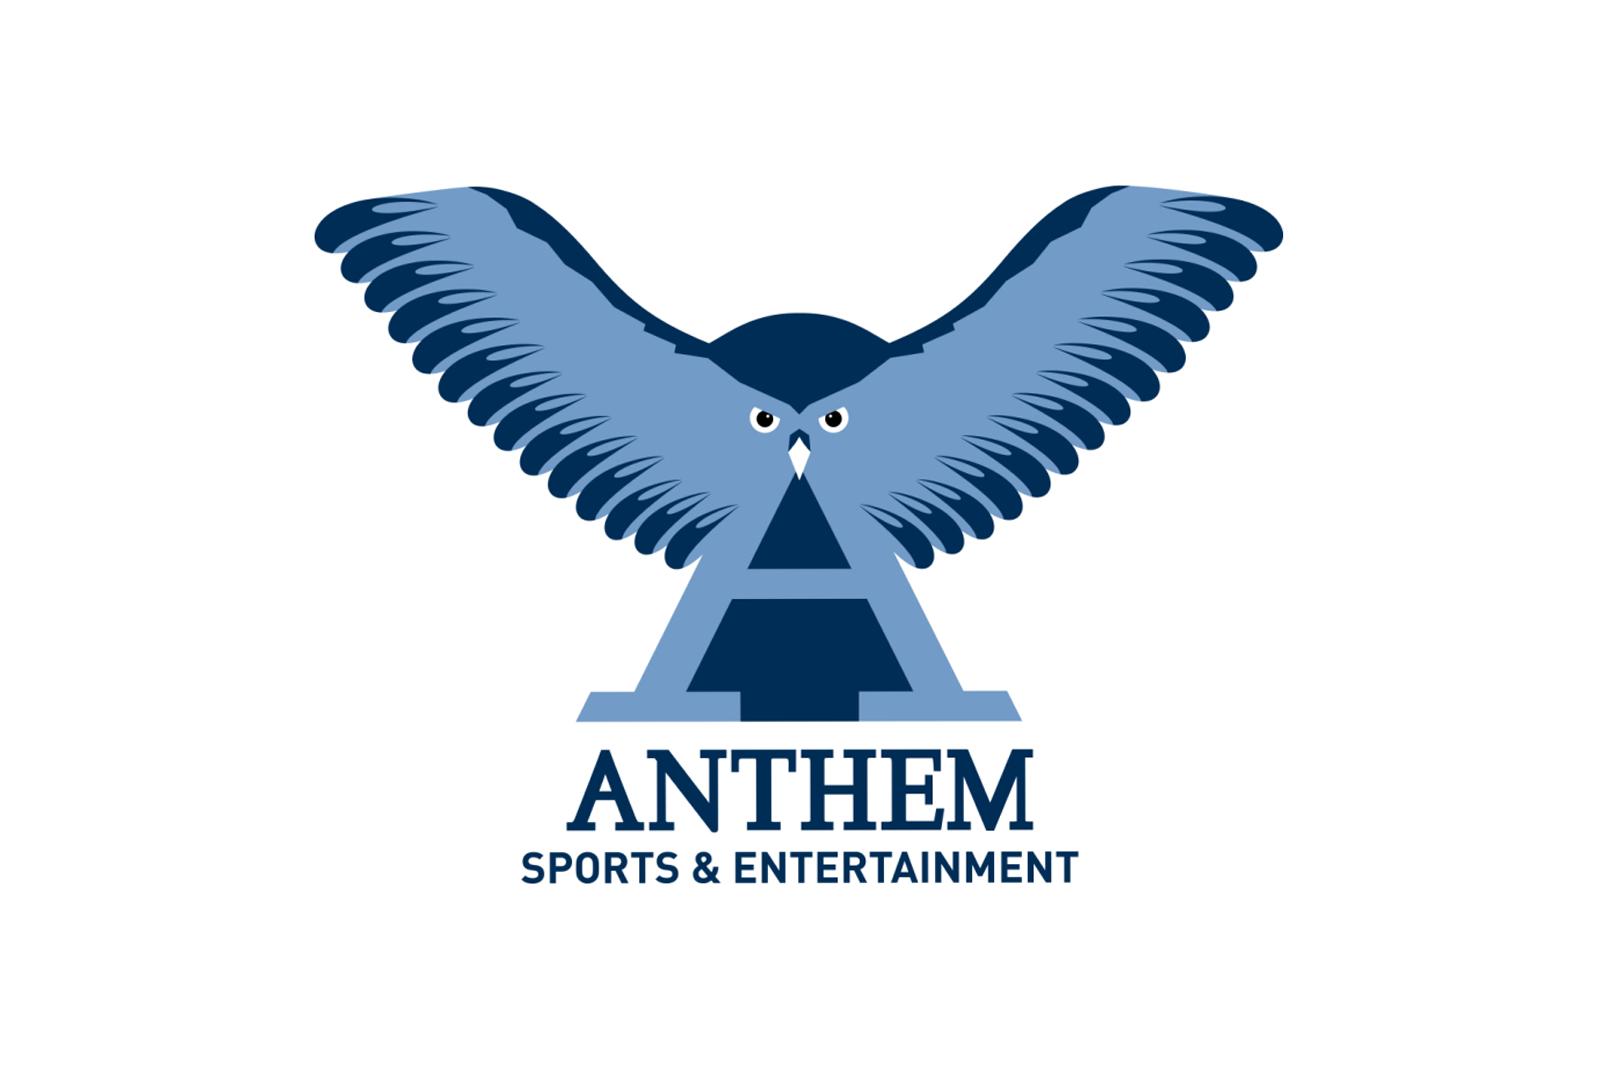 Anthem-Carousel